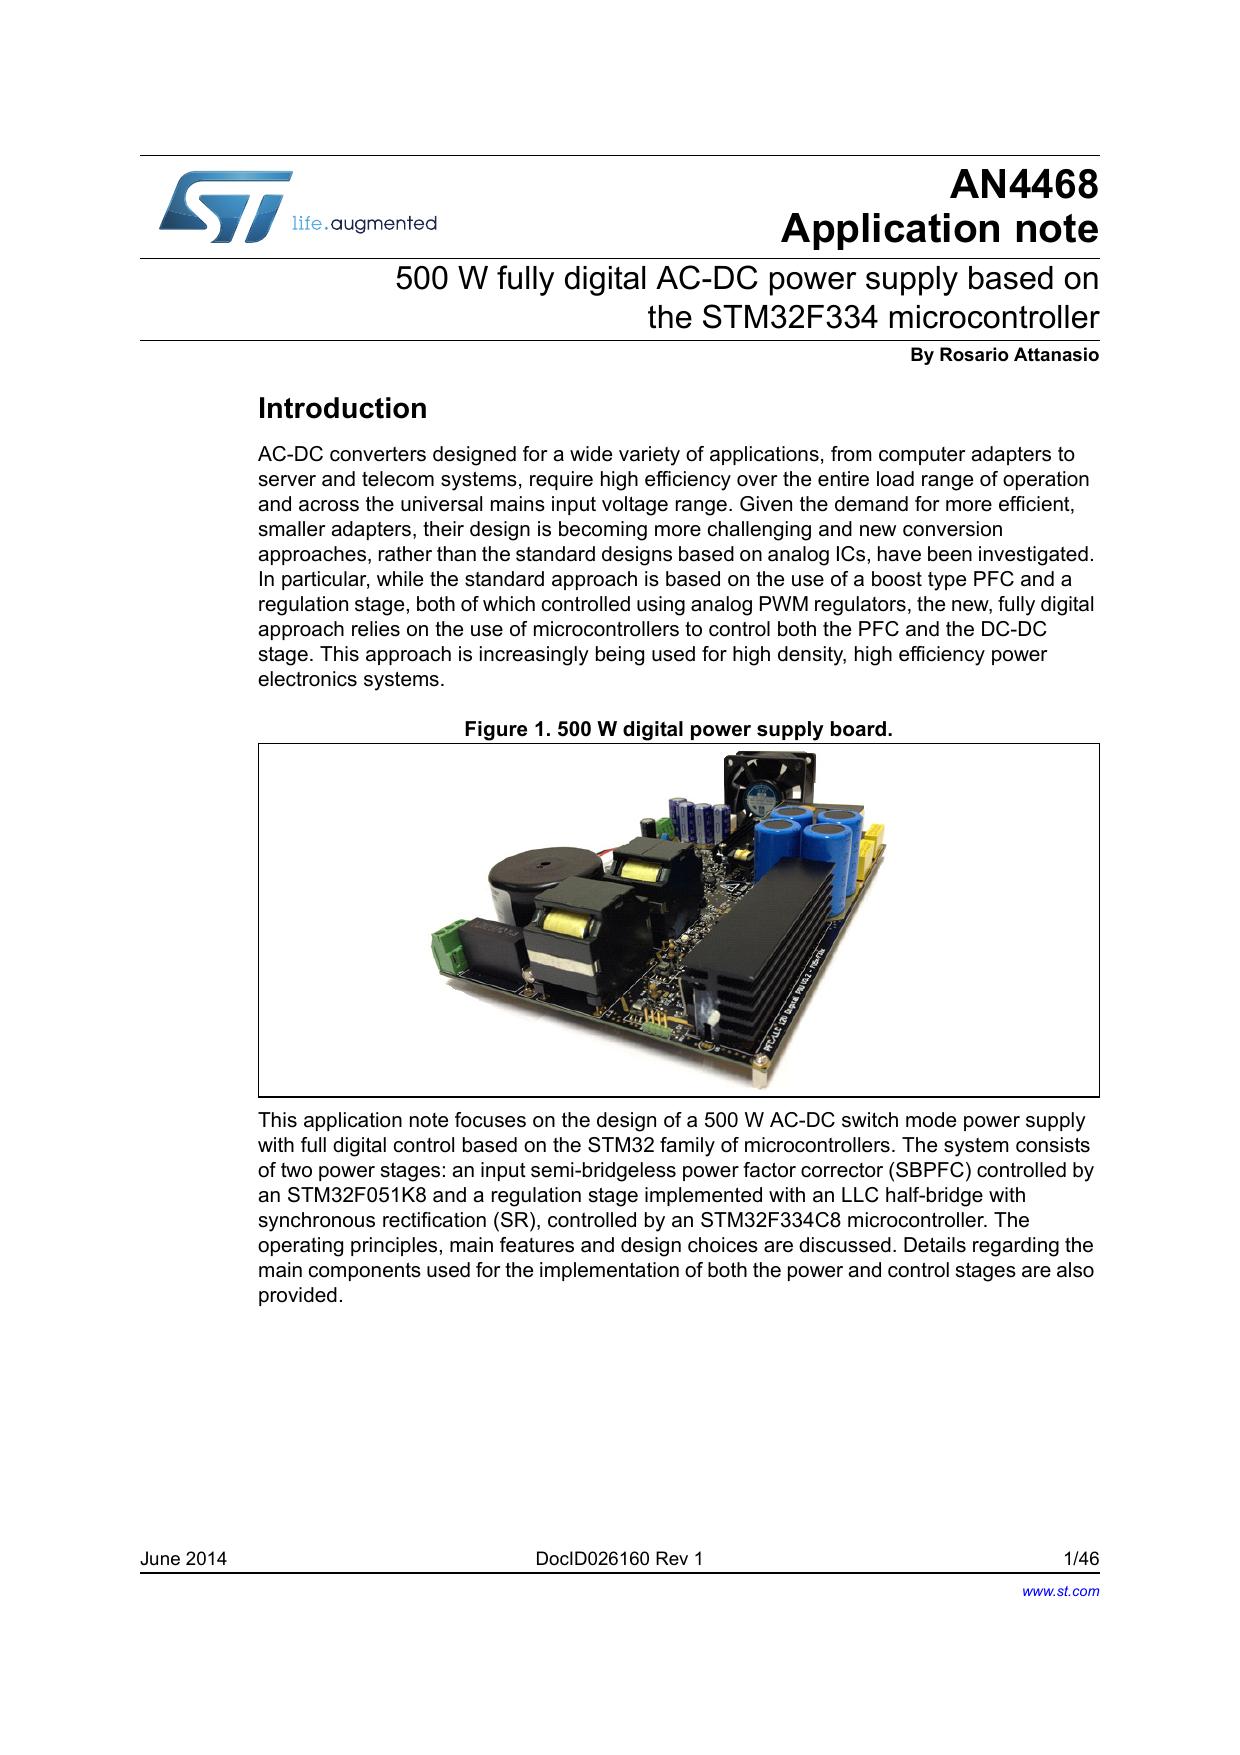 AN4468 - STMicroelectronics